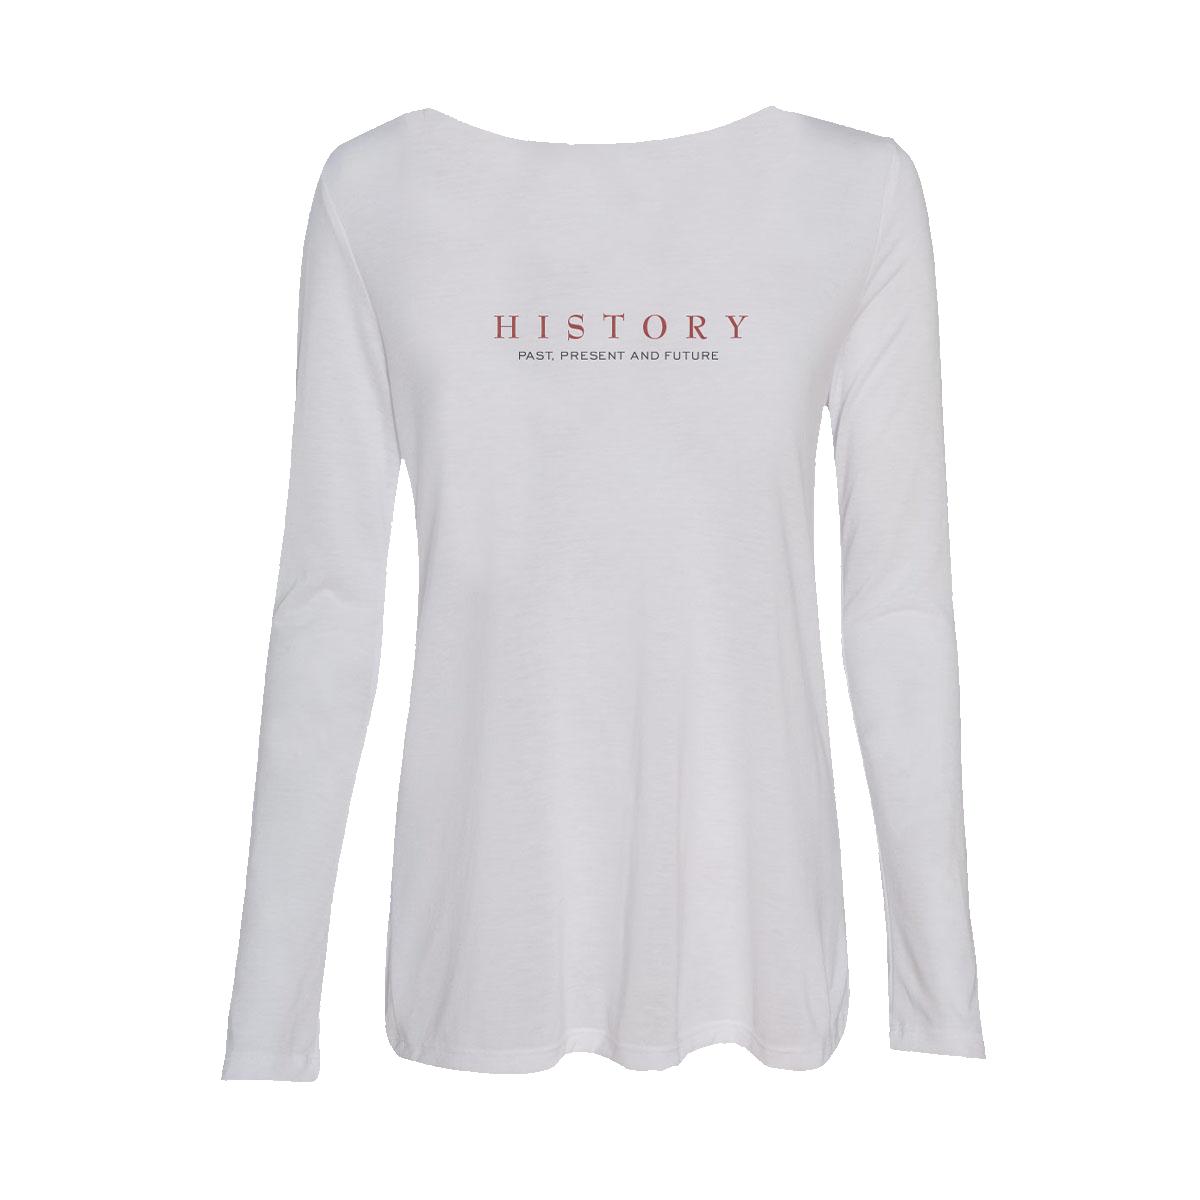 HIStory 25 Women's White L/S Tee